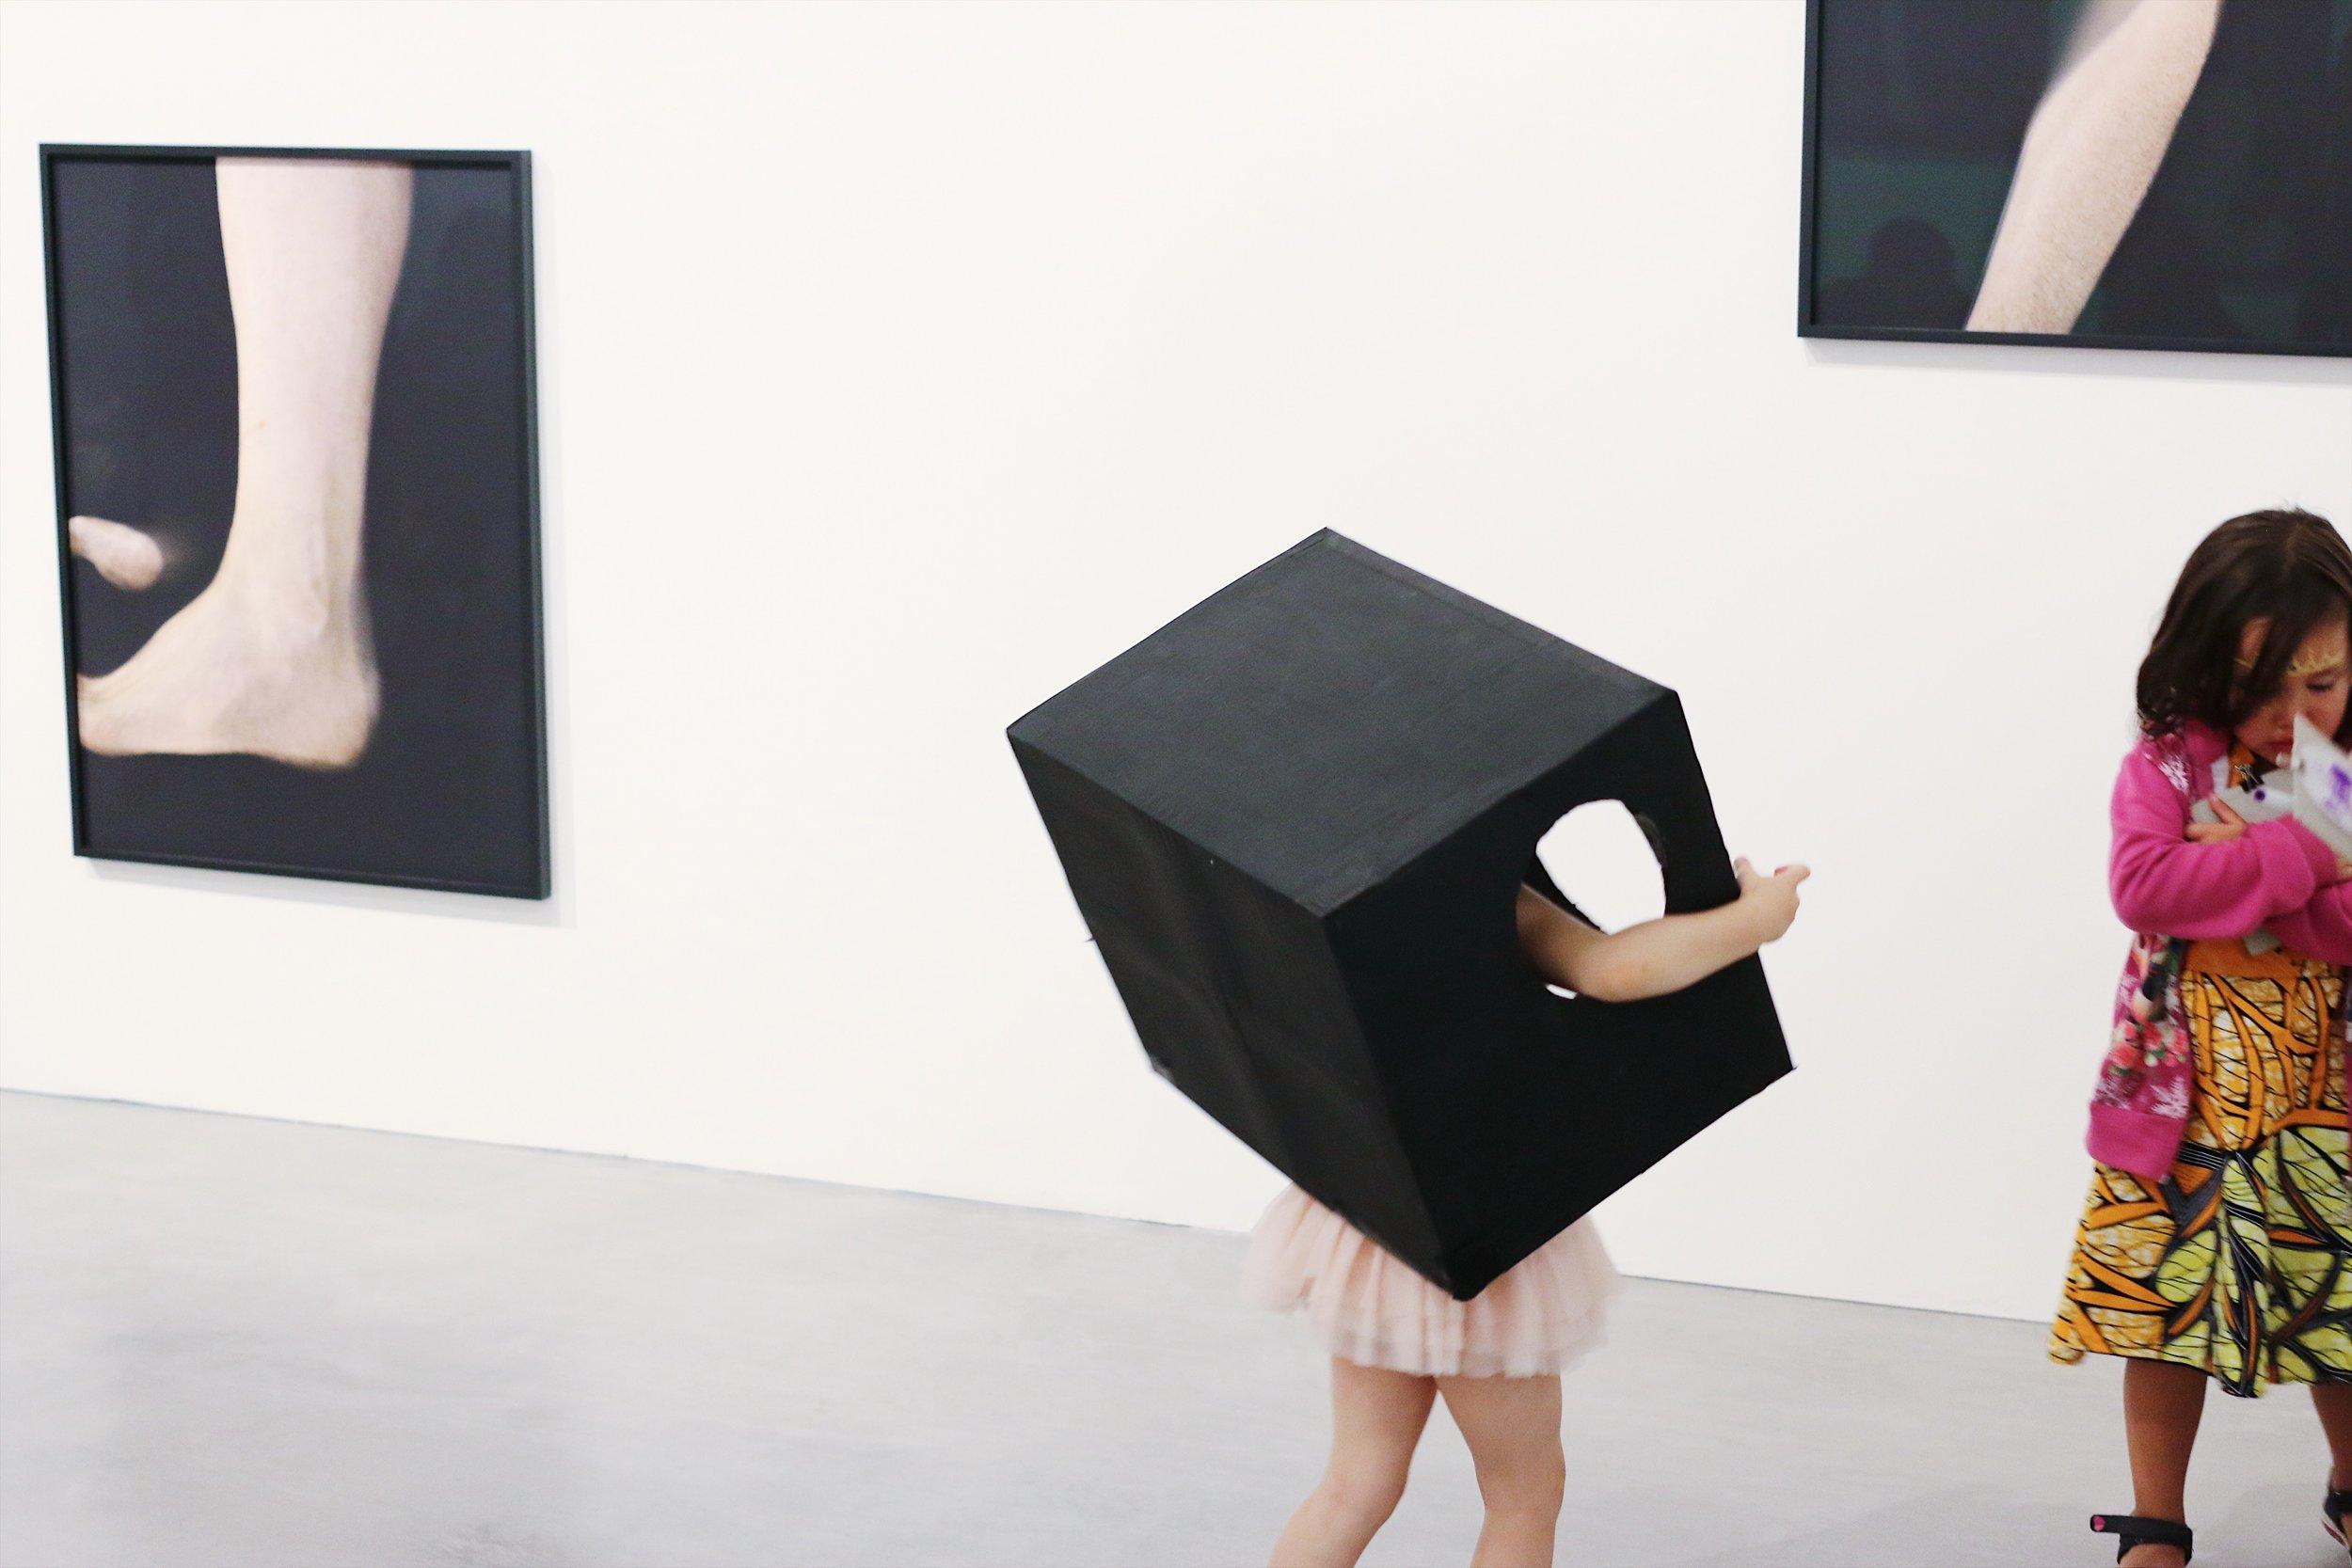 kids in museums, Berlin, familienkunst, kids art, kinderkunst